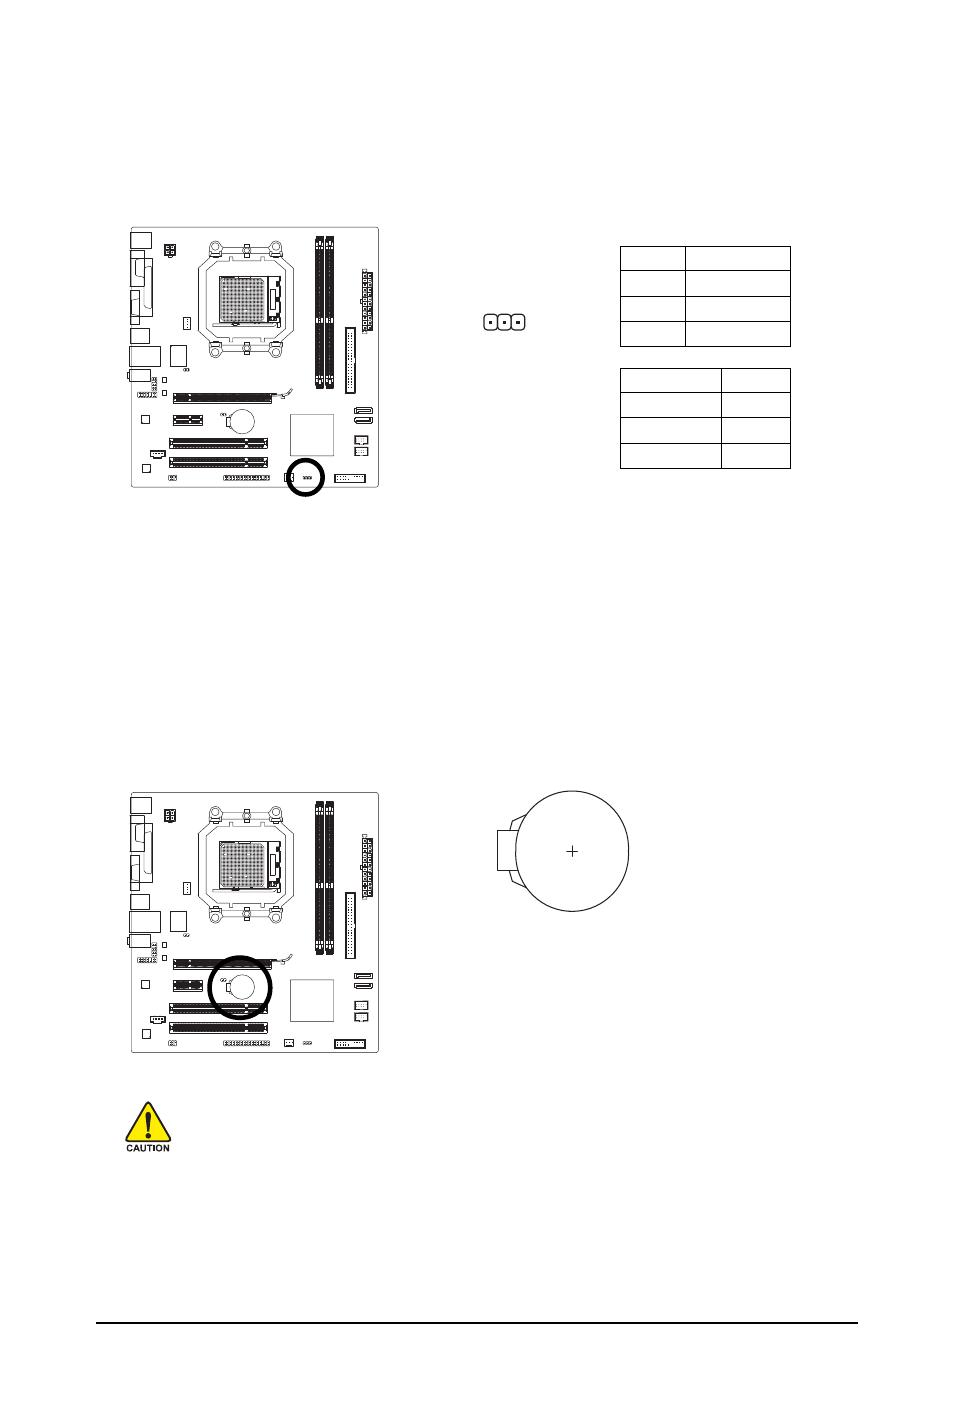 8) pwr_led (system power led header), 9) bat (battery)